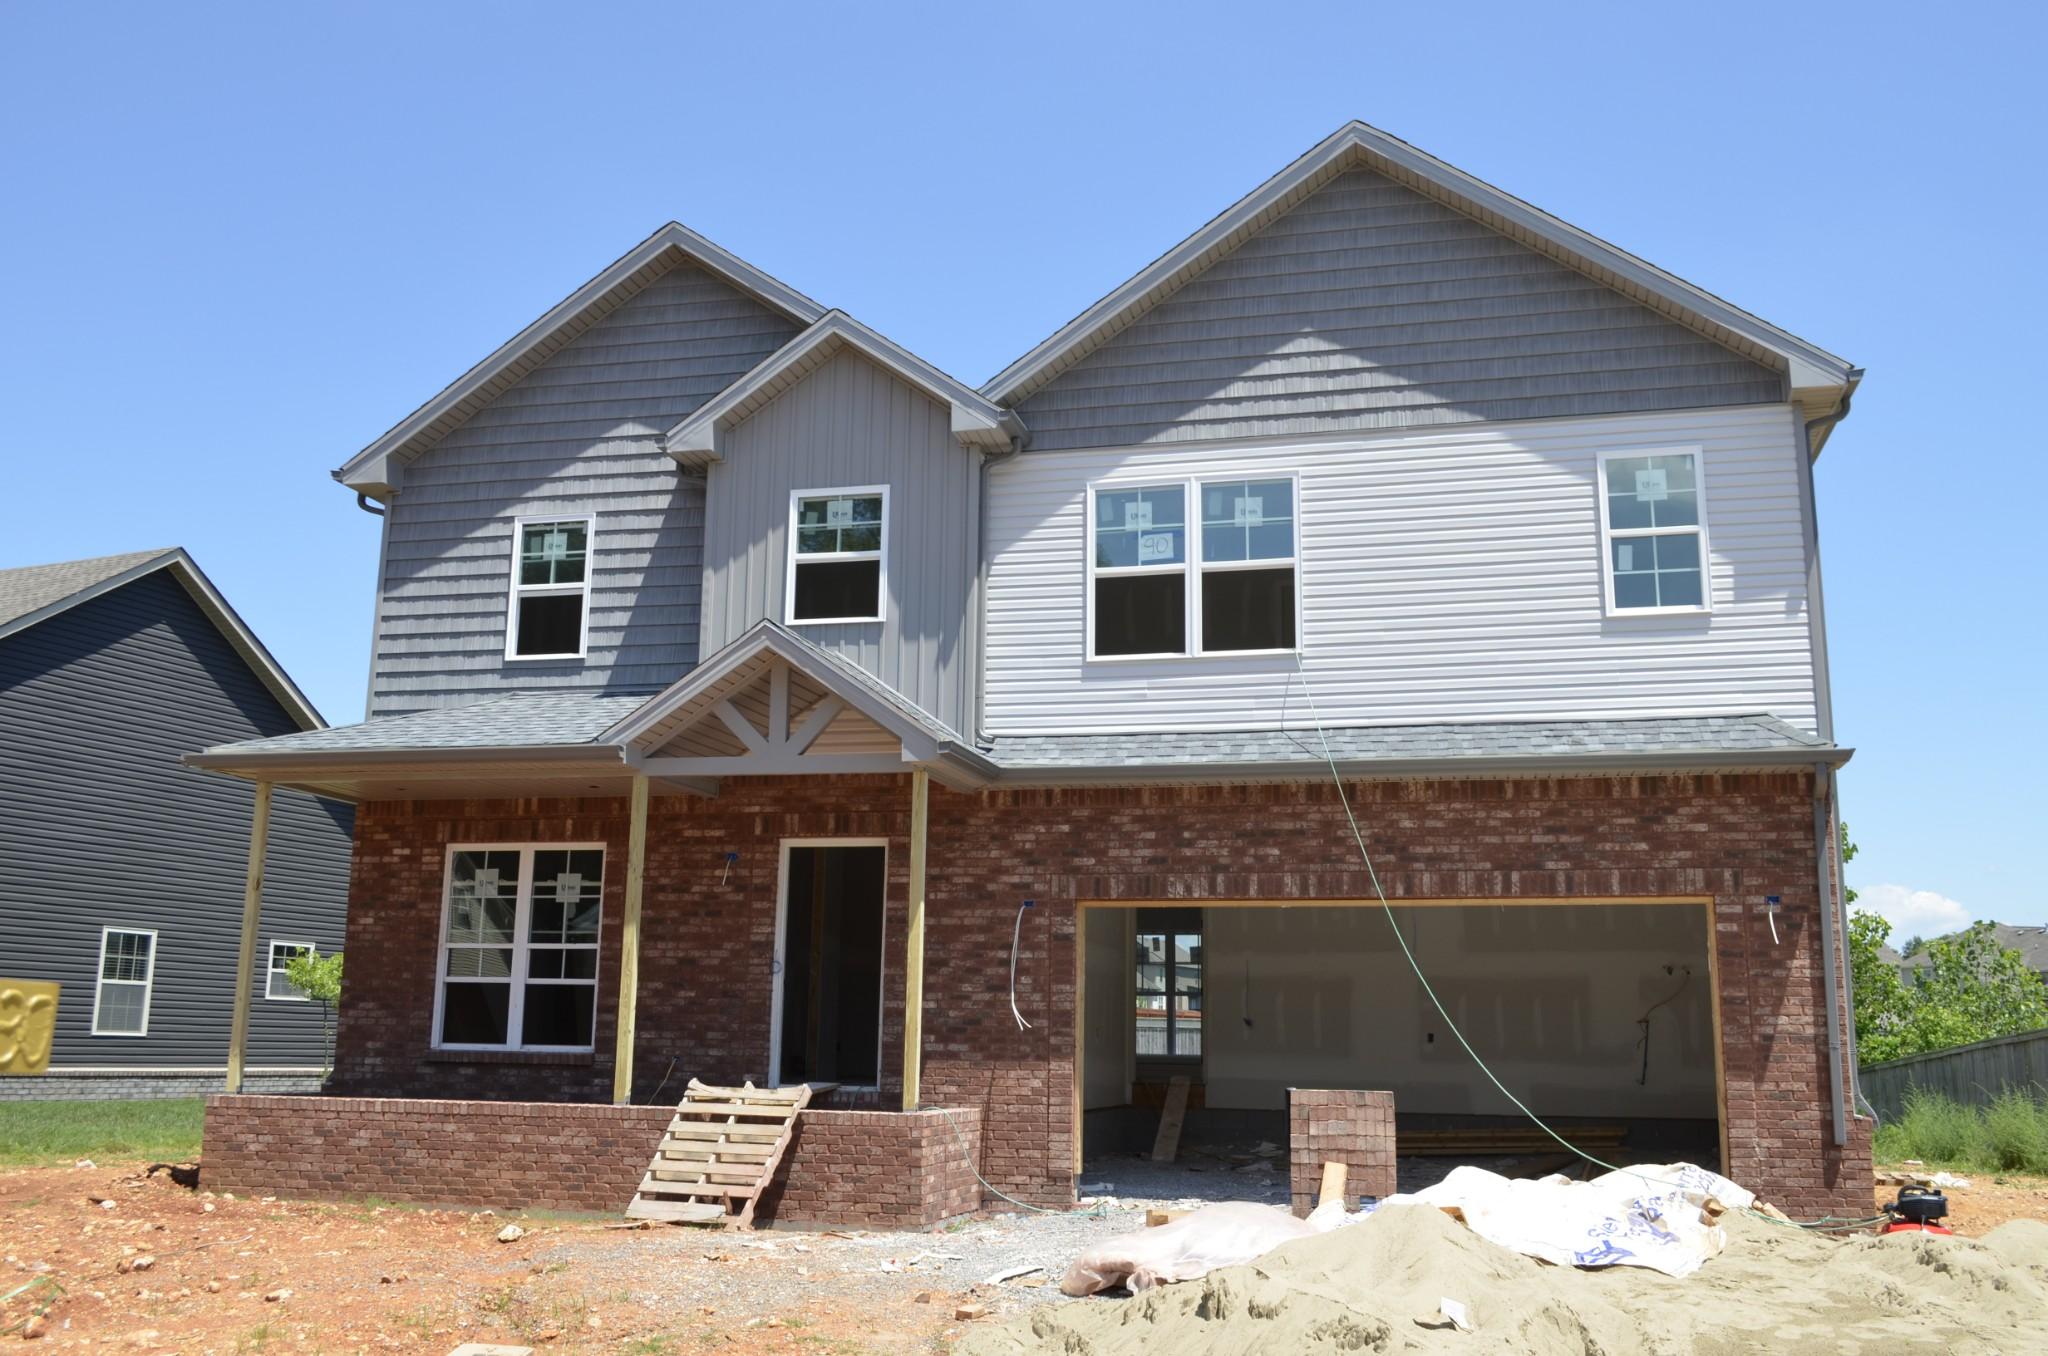 361 Abeline Dr Property Photo - Clarksville, TN real estate listing